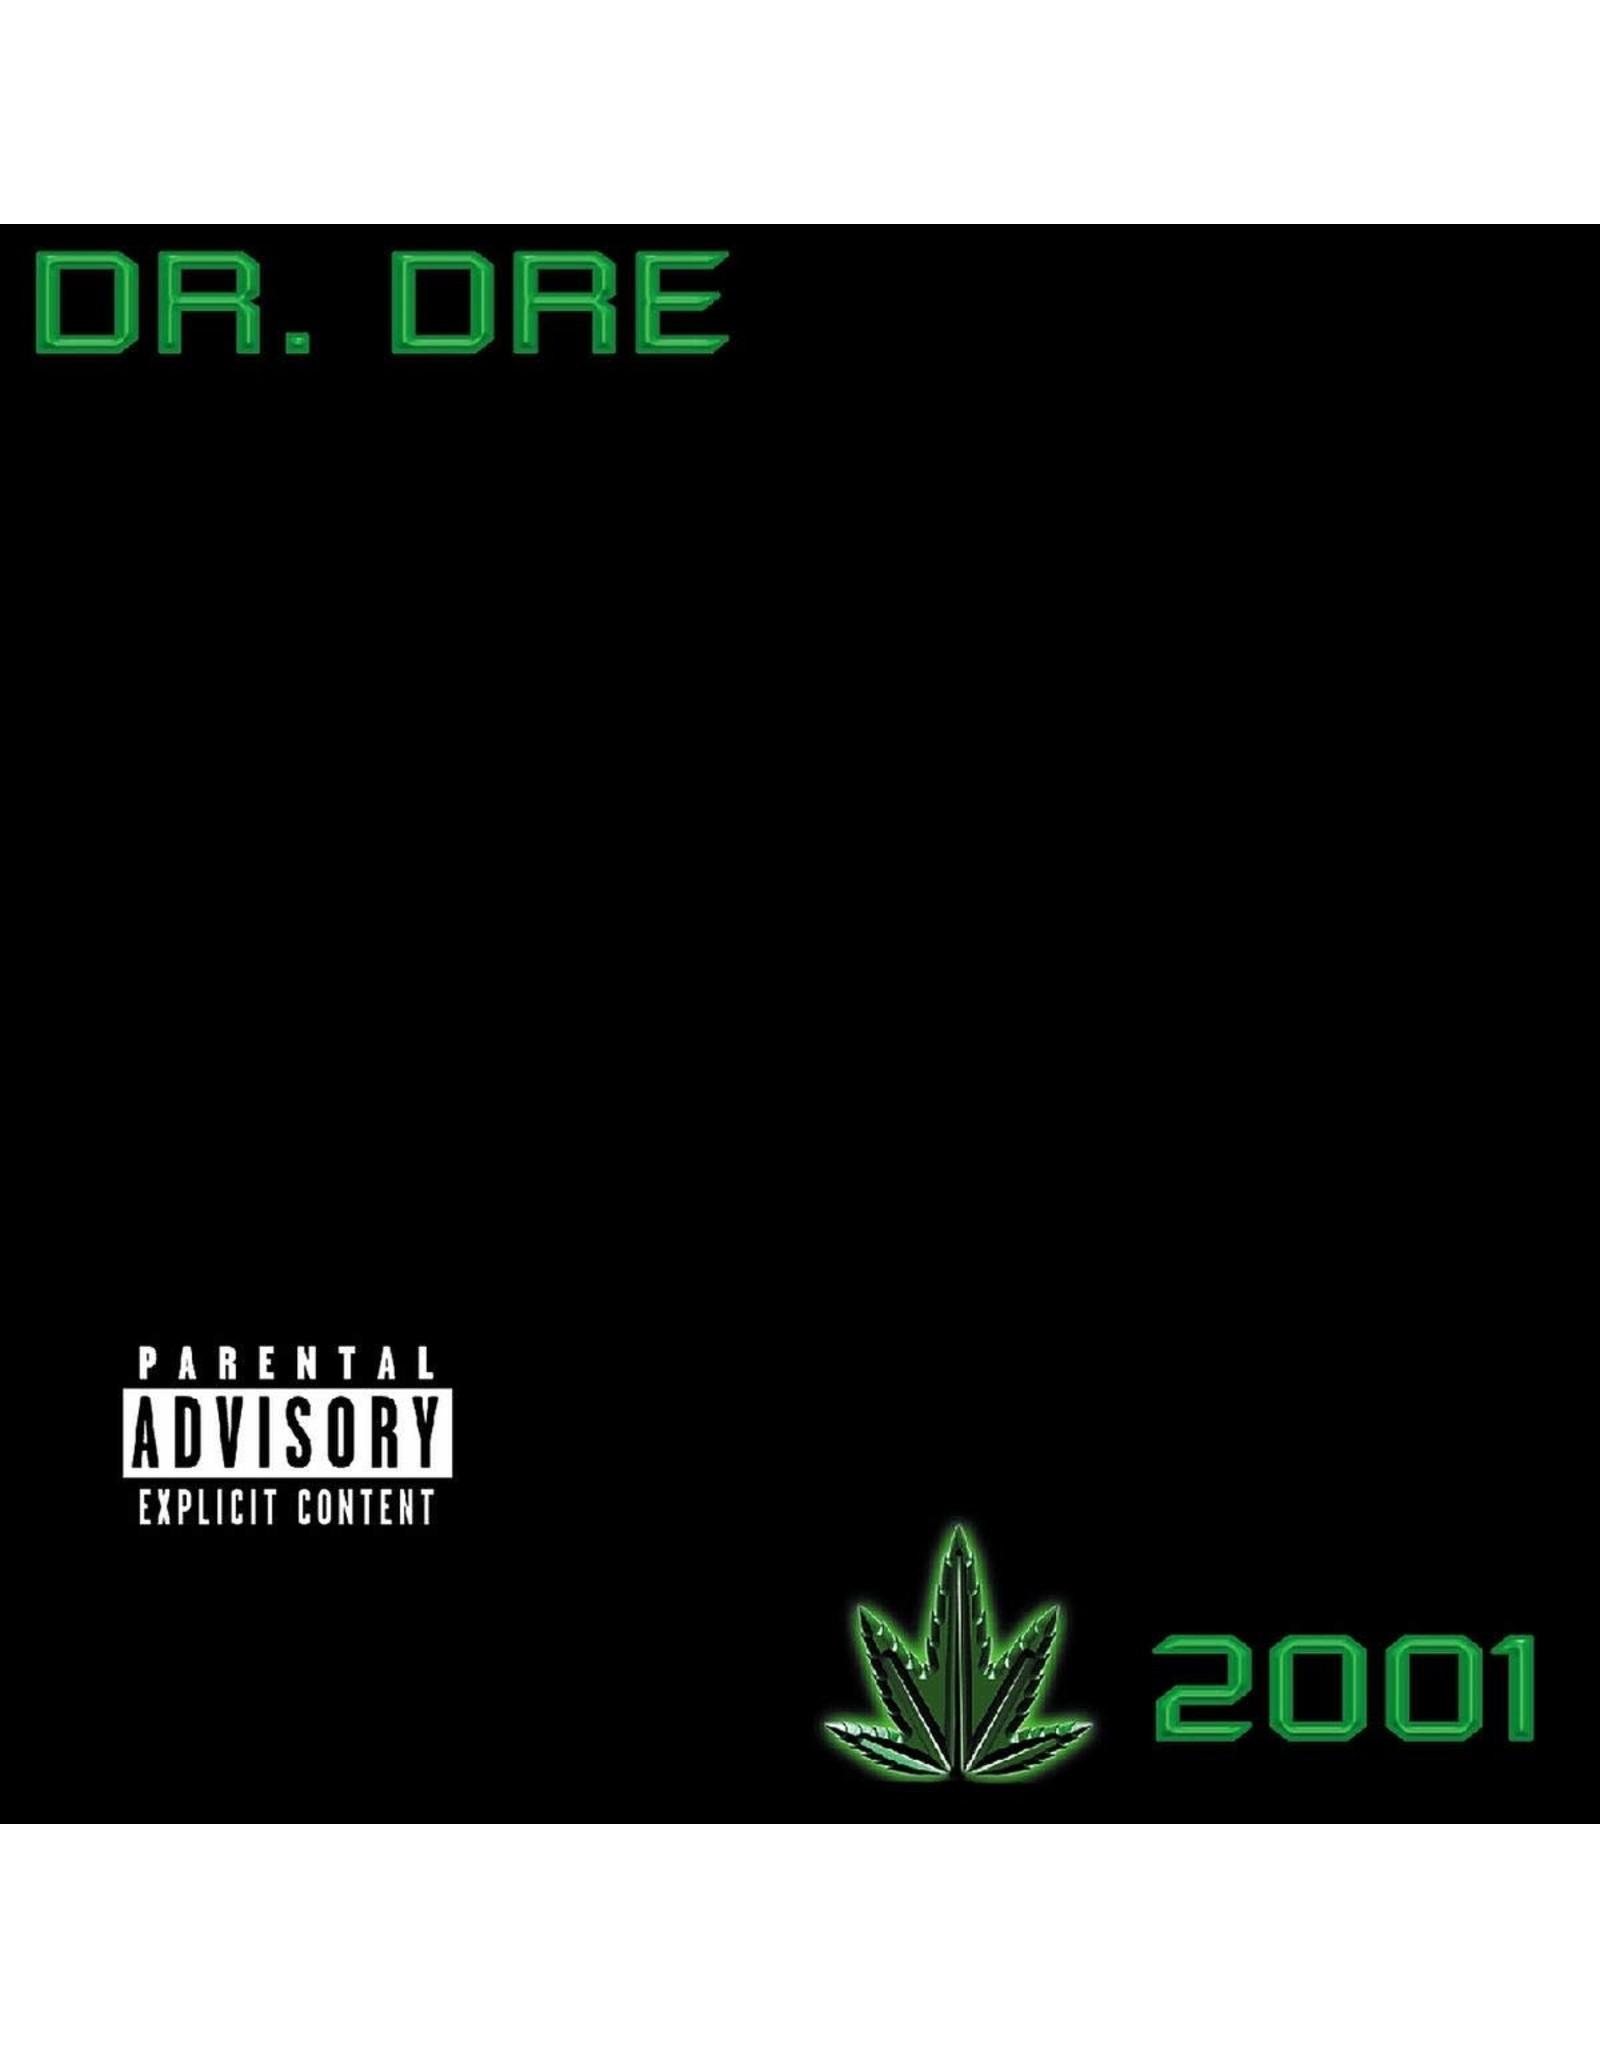 Dr. Dre - 2001 (20th Anniversary)